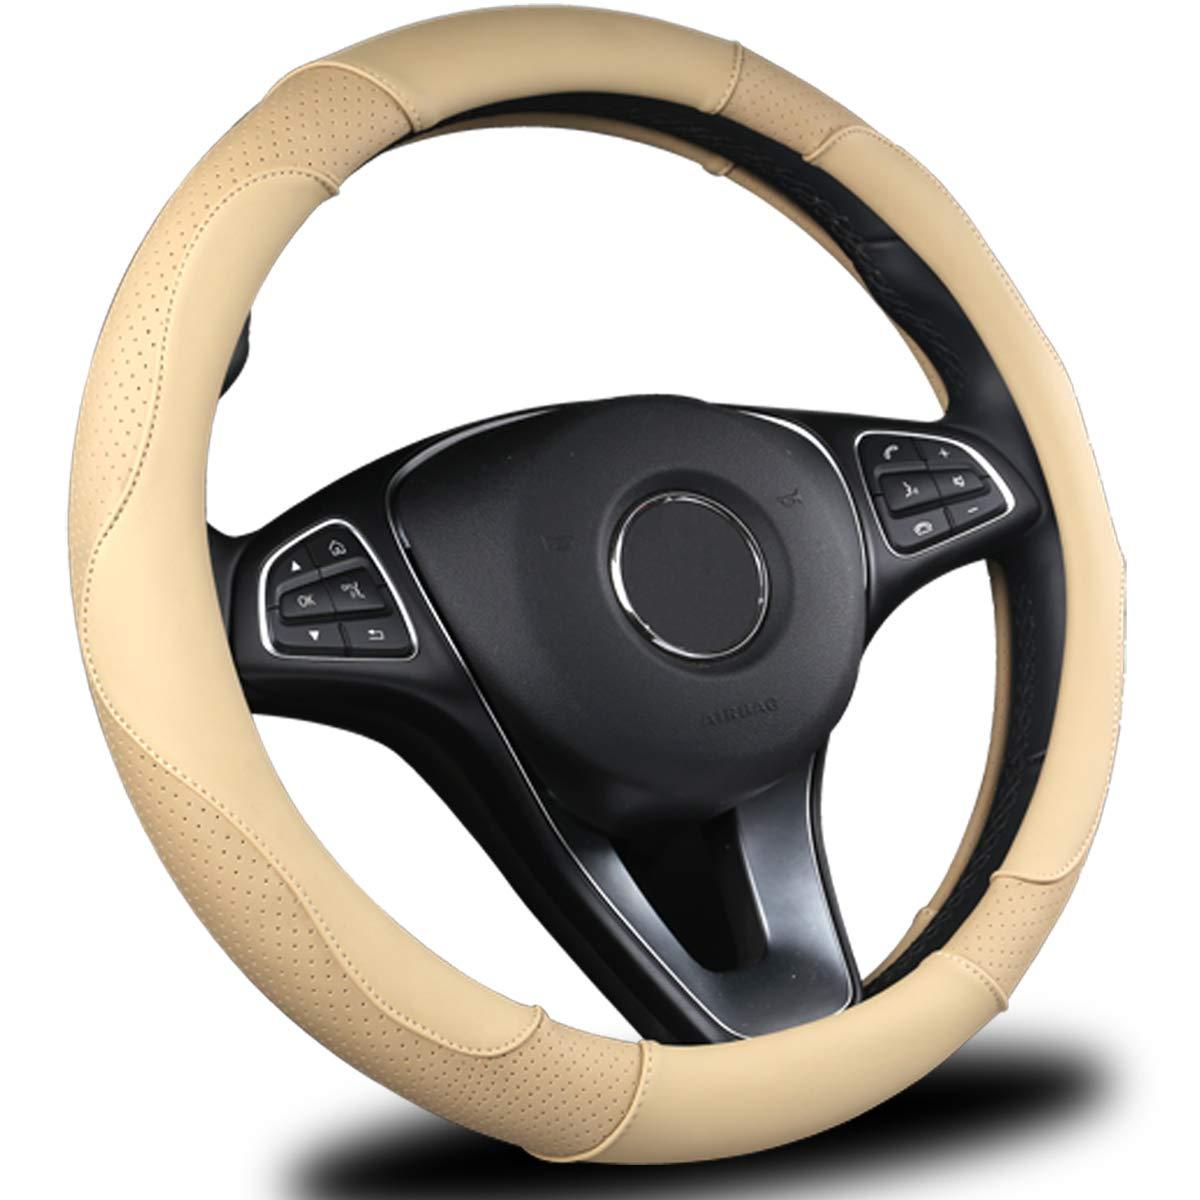 "AmeriLuck Steering Wheel Cover for Car, Universal 15"", Odorless Breathable, Anti-Slip, Sporty, Soft and Snug Grip (Micro Fiber, Beige)"